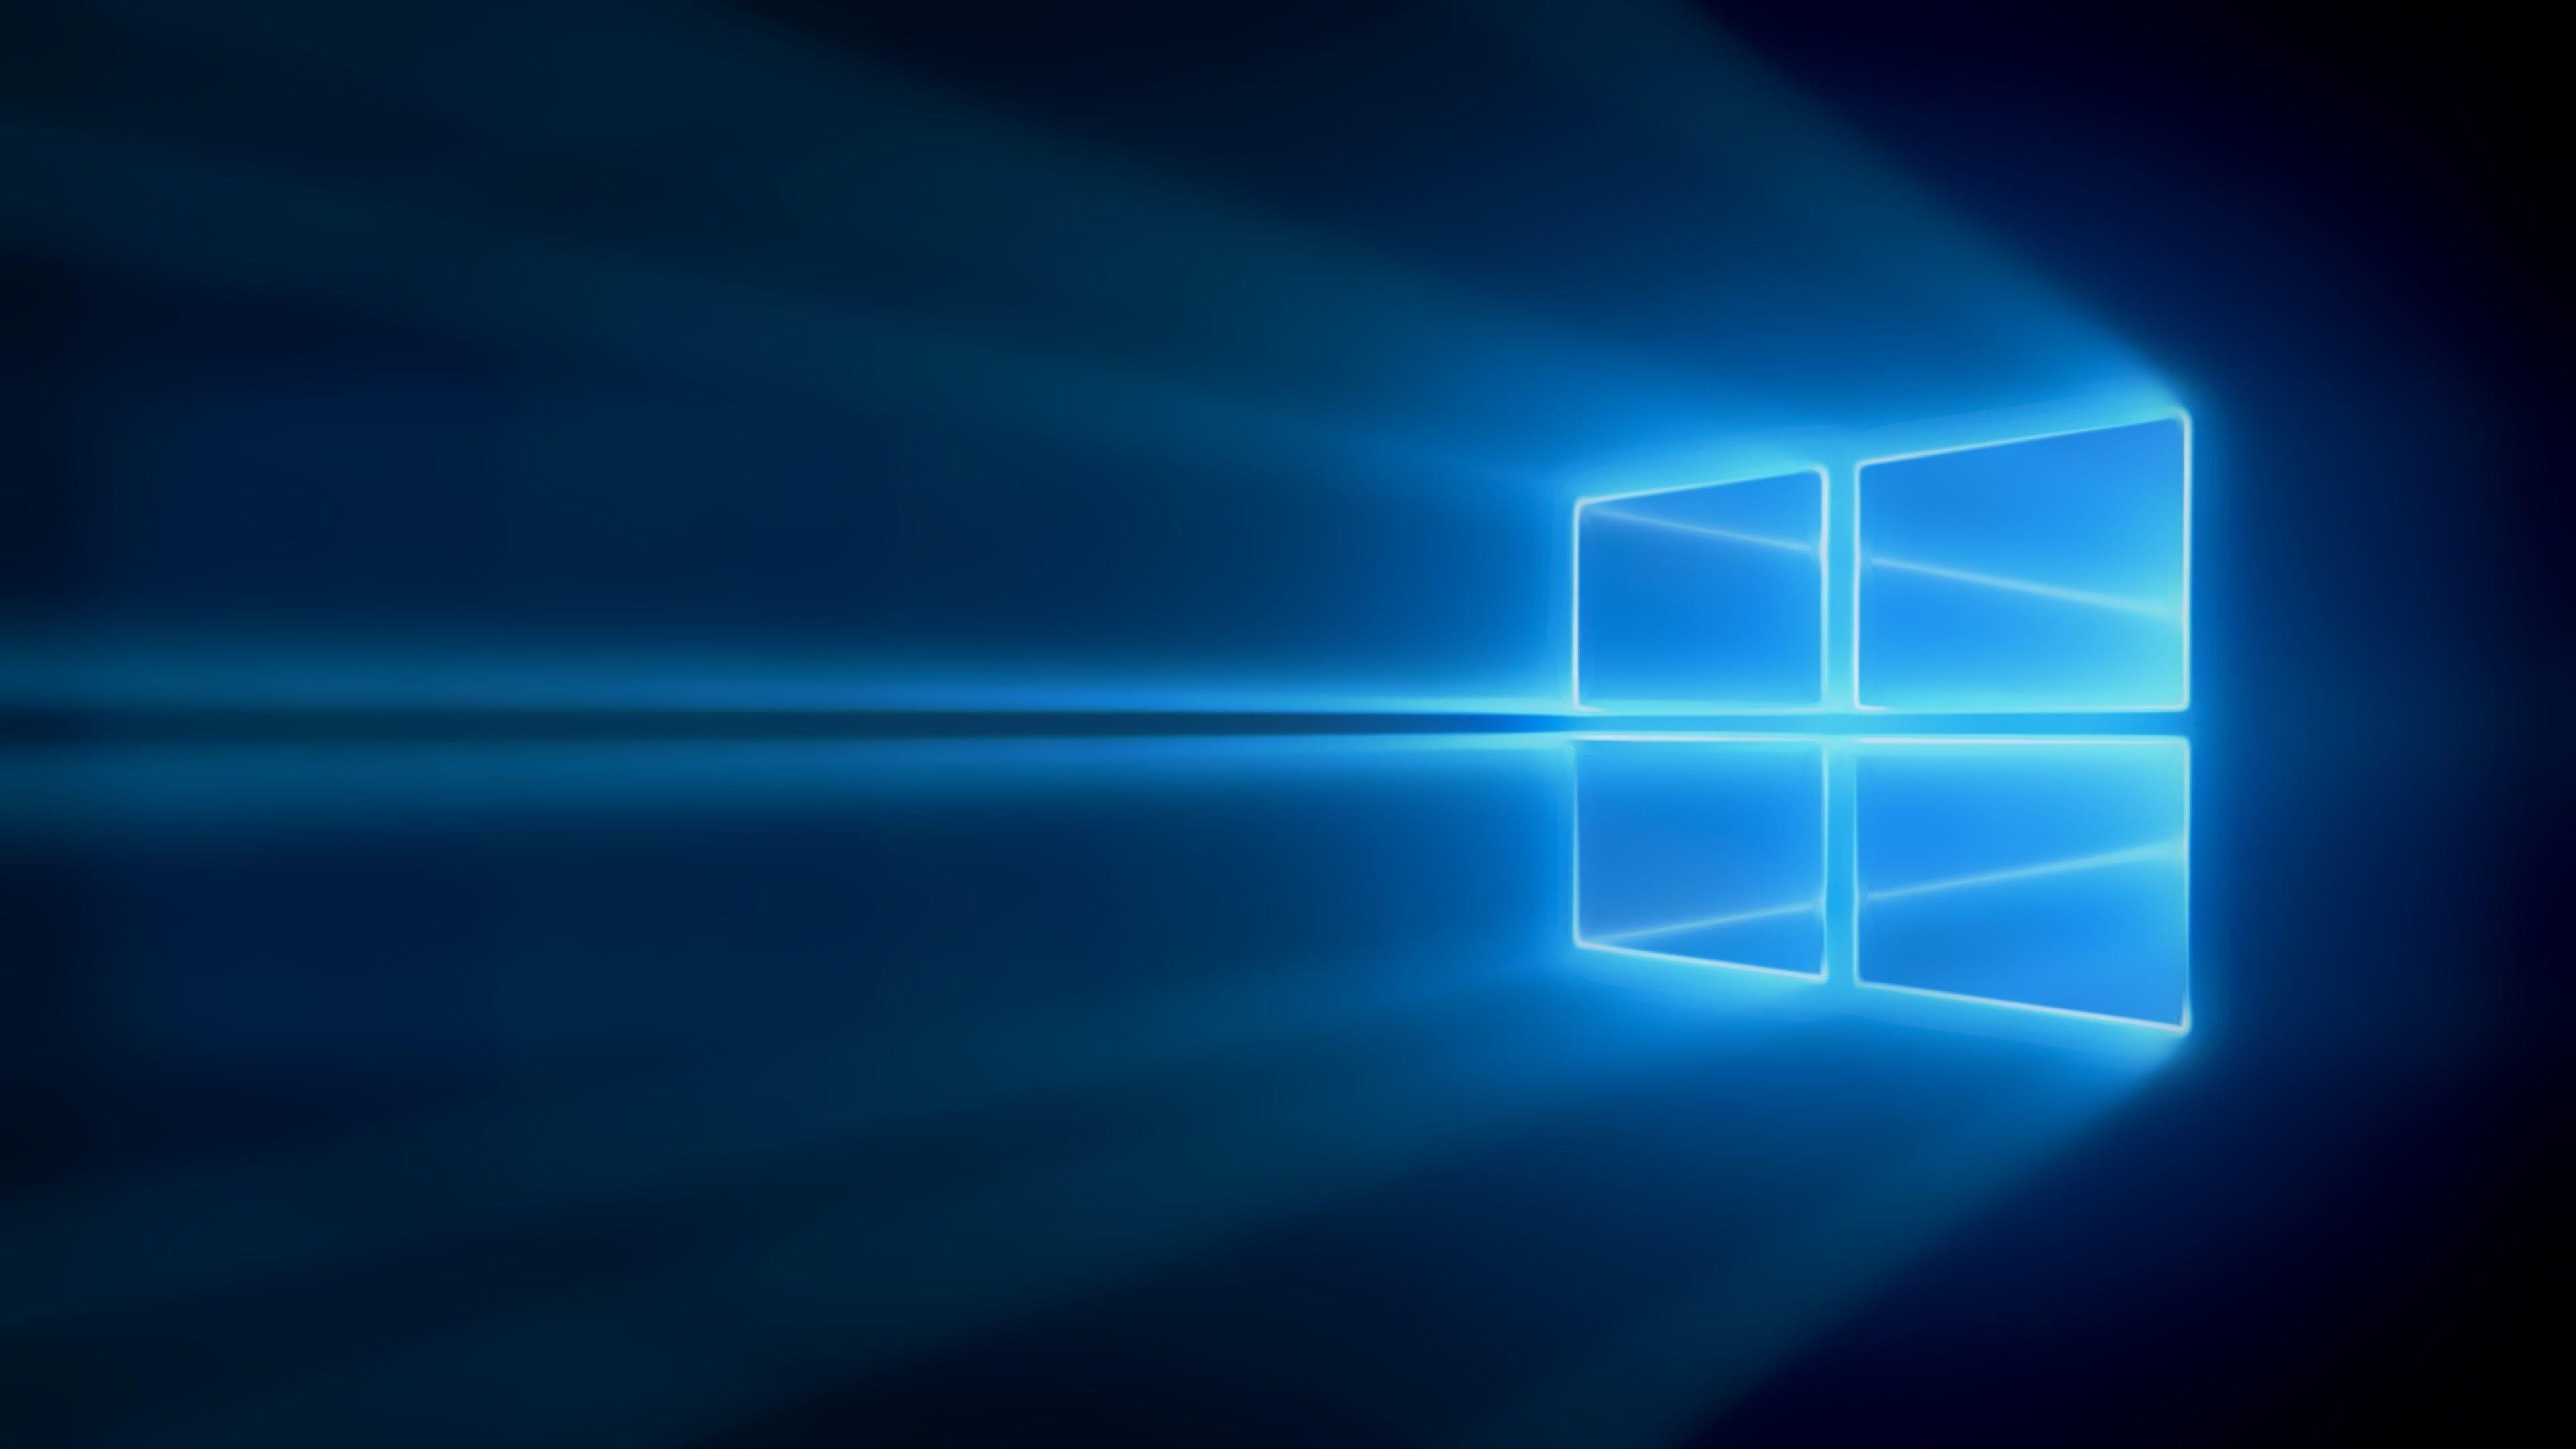 Windows 10 2560 X 1440 Wallpaper Wallpapersafari Windows Wallpaper Wallpaper Windows 10 Windows Desktop Wallpaper